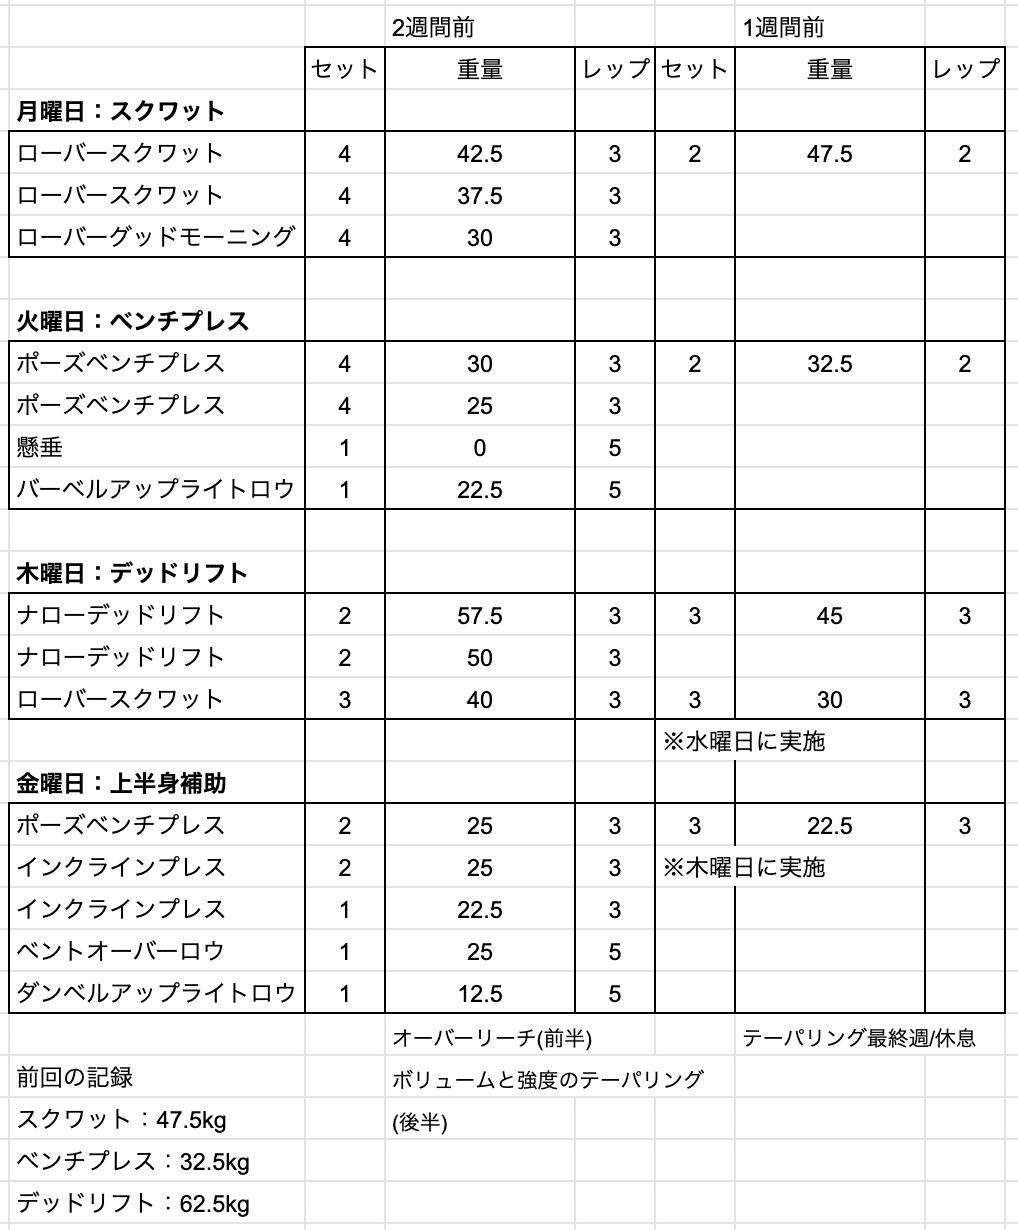 44kg選手のピーキング